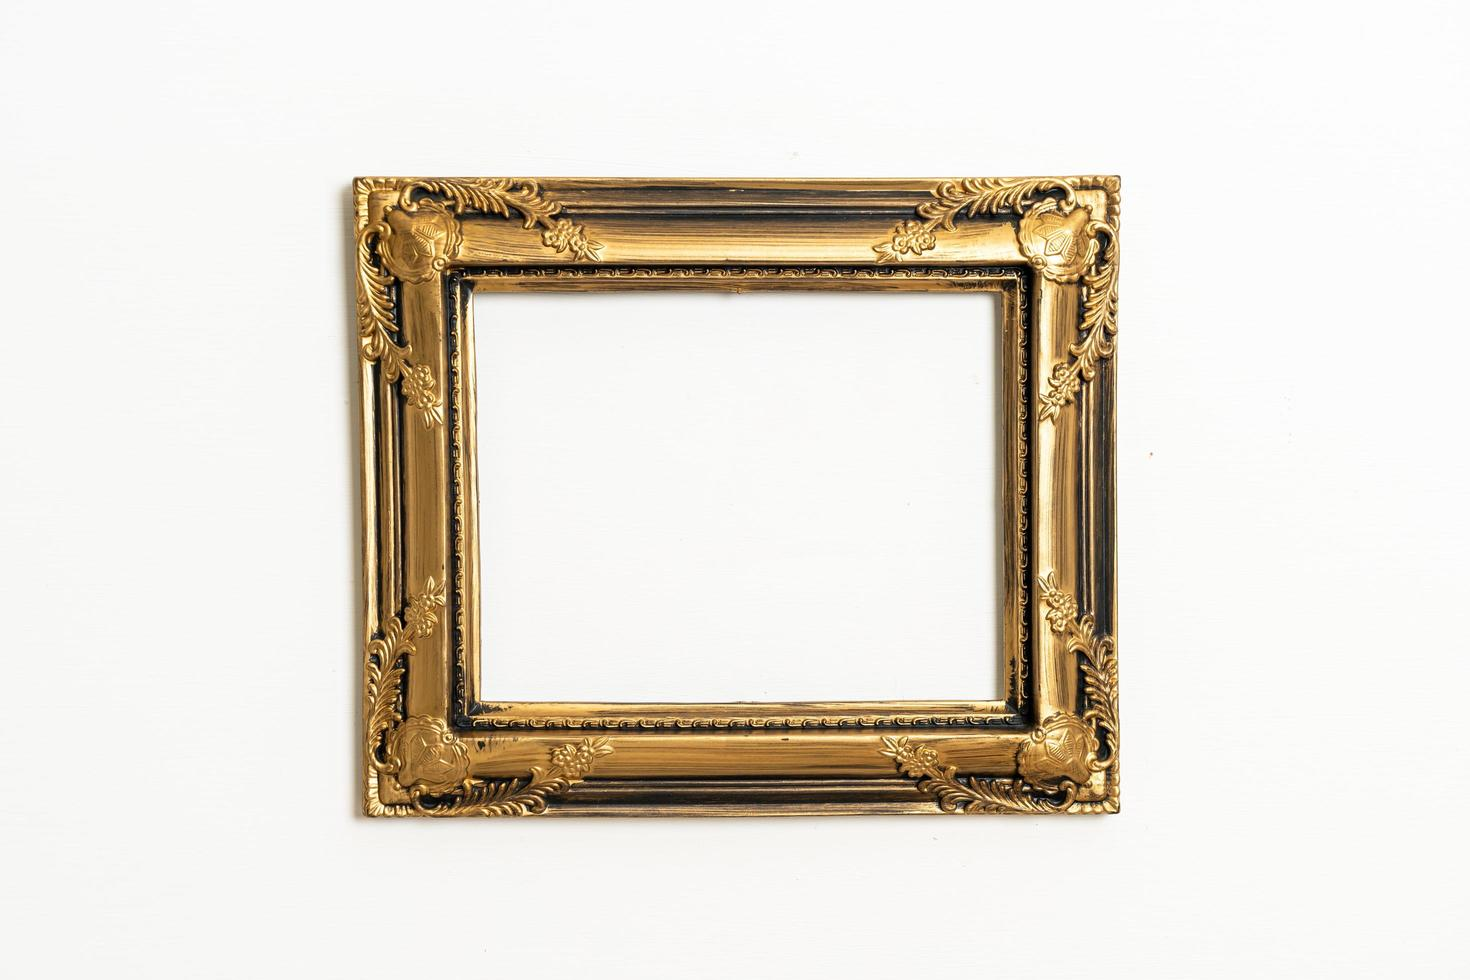 lege afbeeldingsframe op witte muur achtergrond met kopie ruimte foto